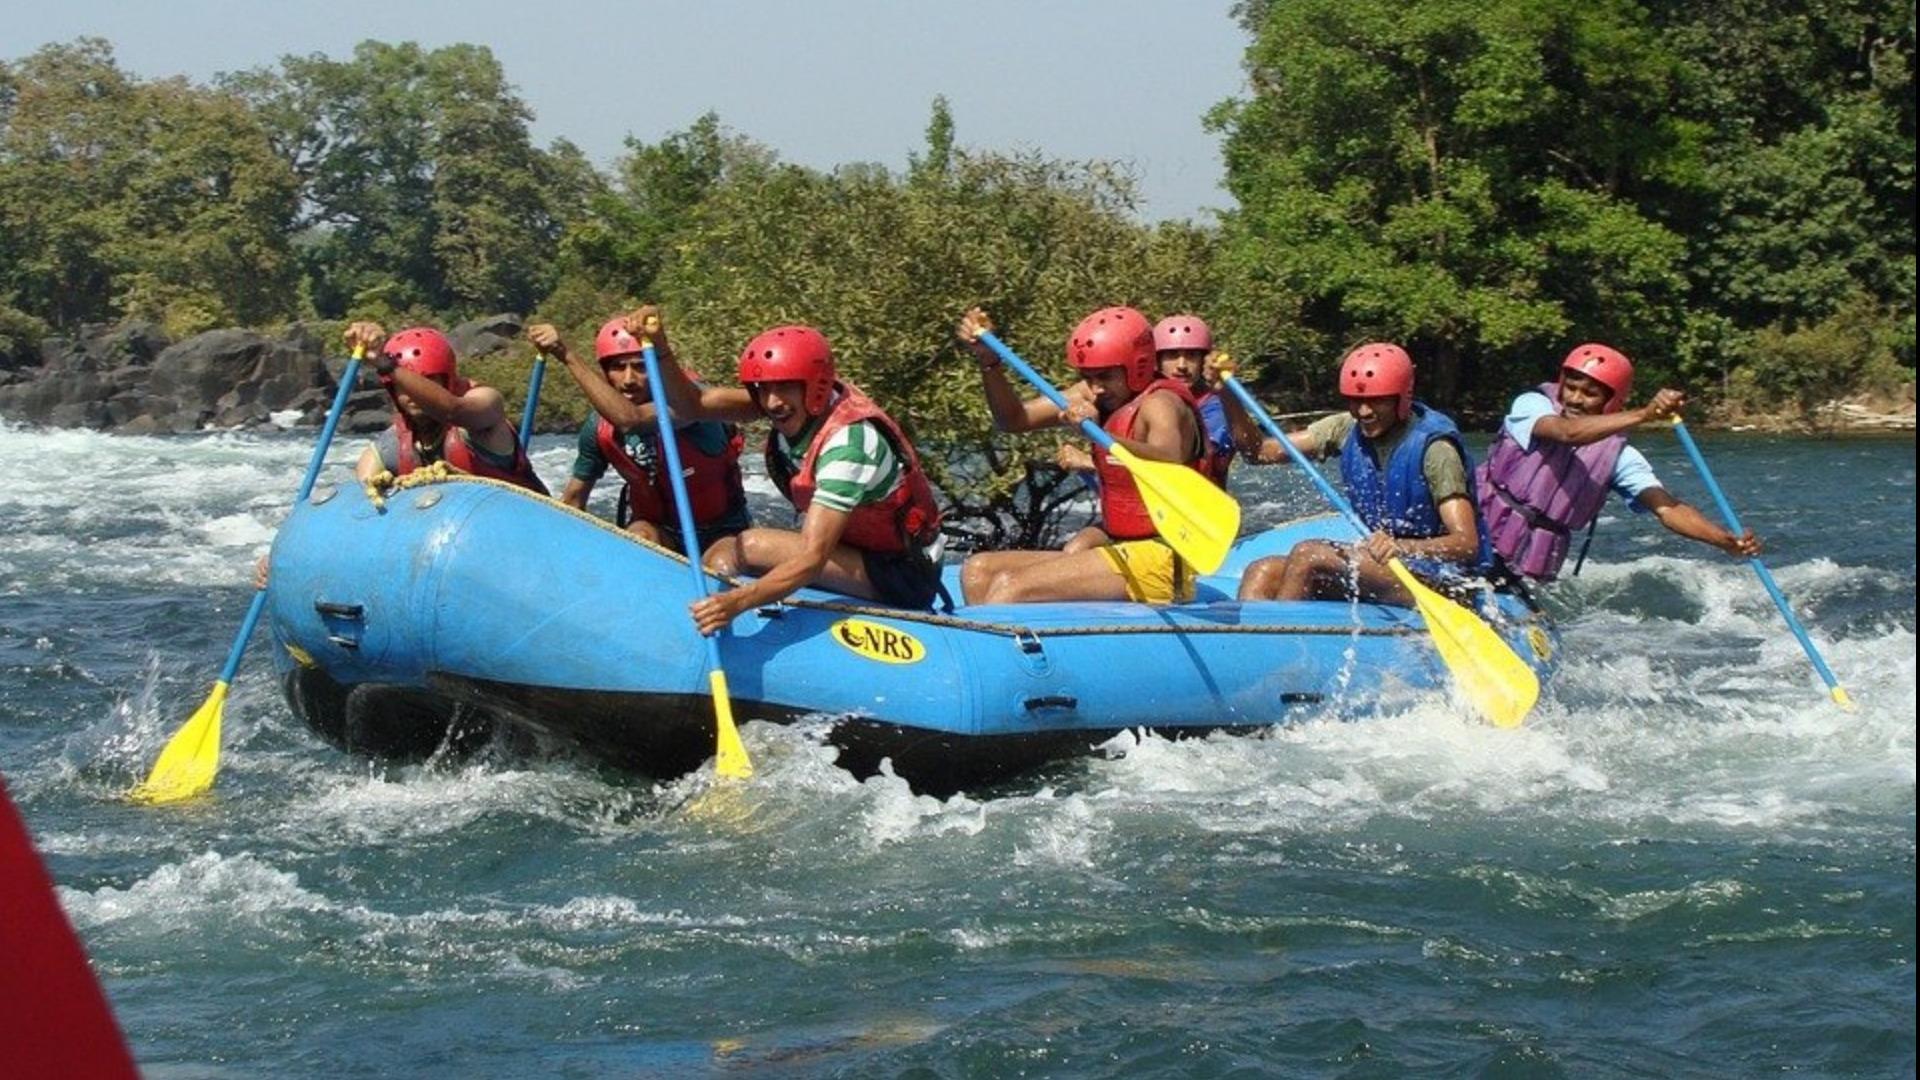 Kolad River Rafting at Kundalika River on 15th September 2019 Tickets by  TREKS AND TRAILS, INDIA, 15 Sep, 2019, Kolad Event